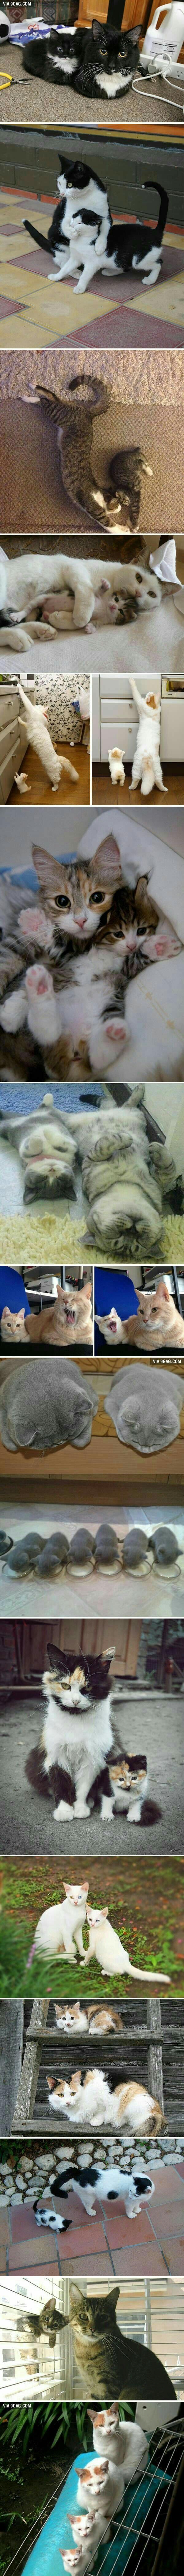 Cats & their mini-me kittens.